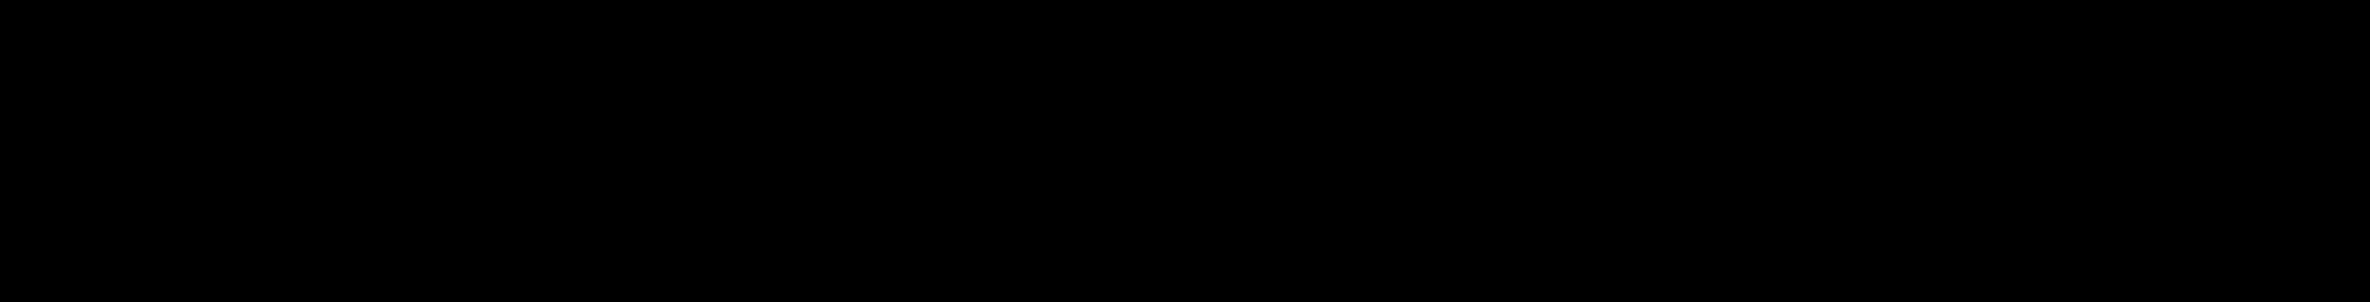 Sykkel Komponenter